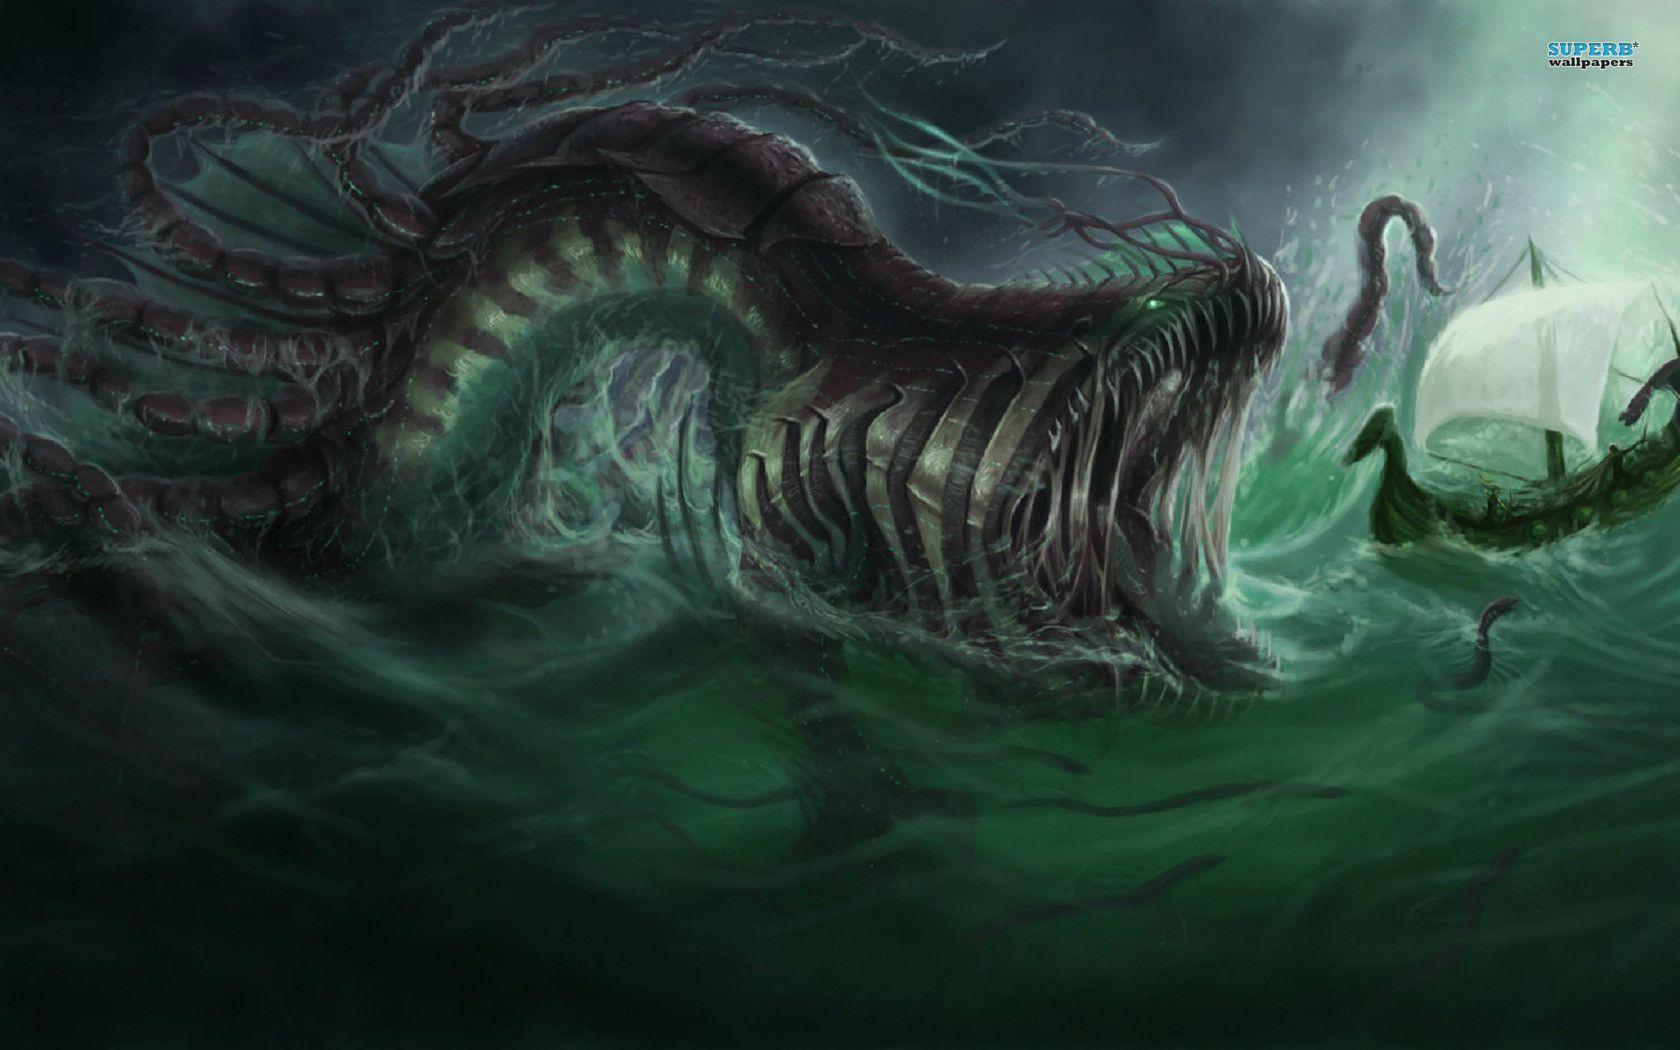 Giant Sea Dragon Wallpapers Top Free Giant Sea Dragon